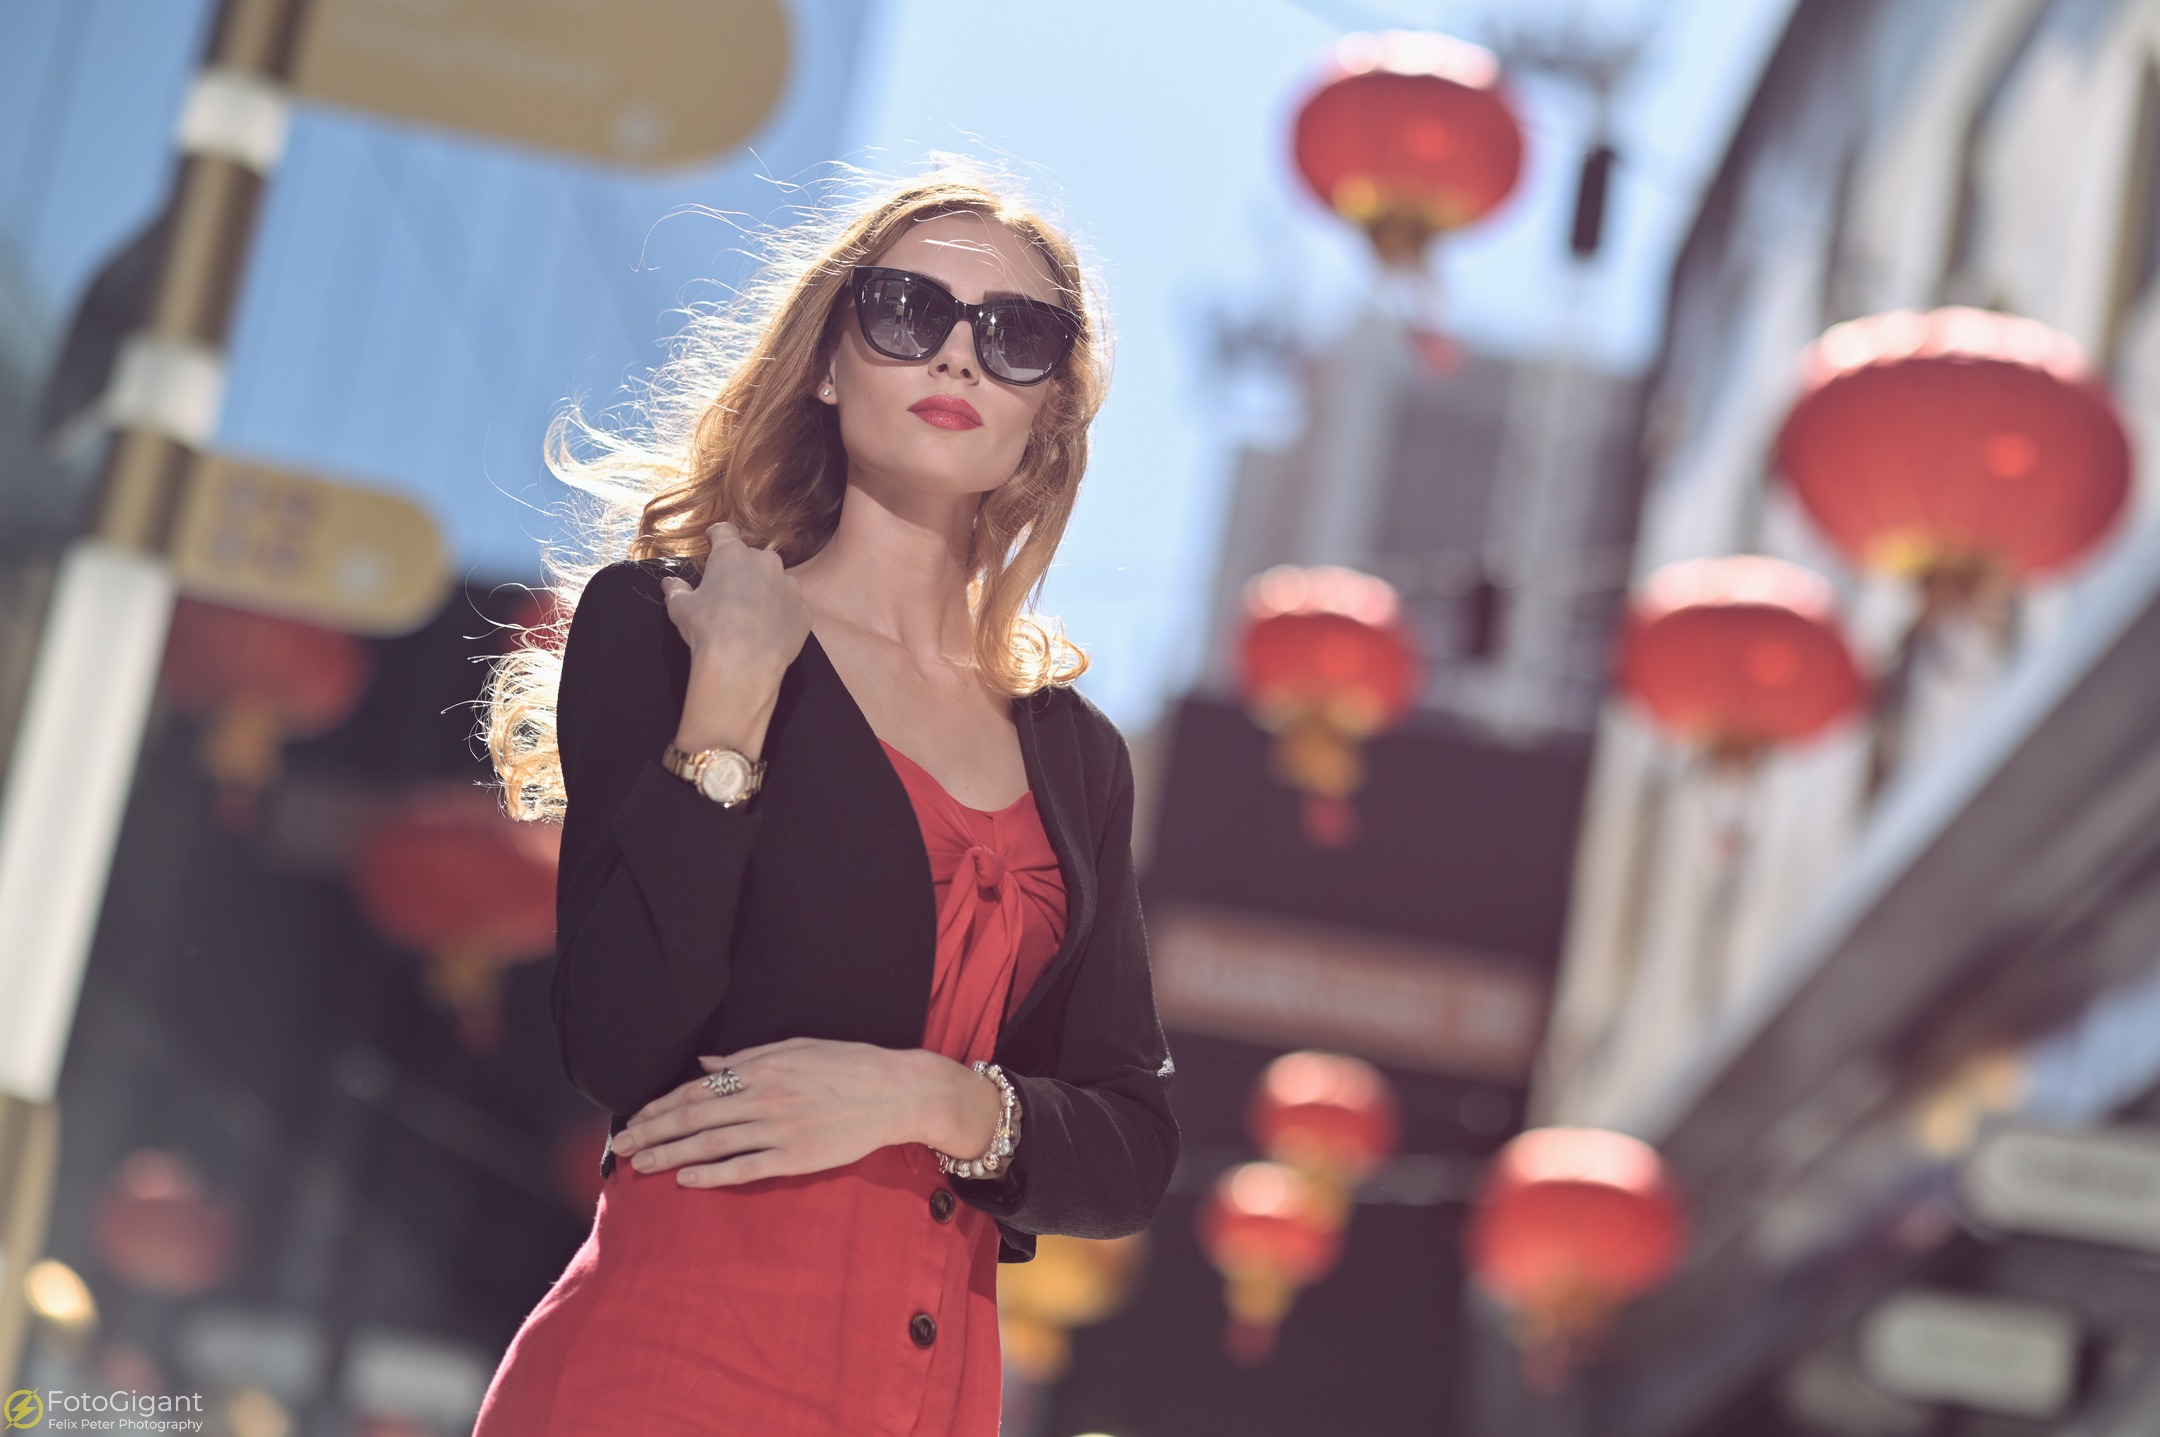 Alina_Fashion-Photography_Perth_01.jpg